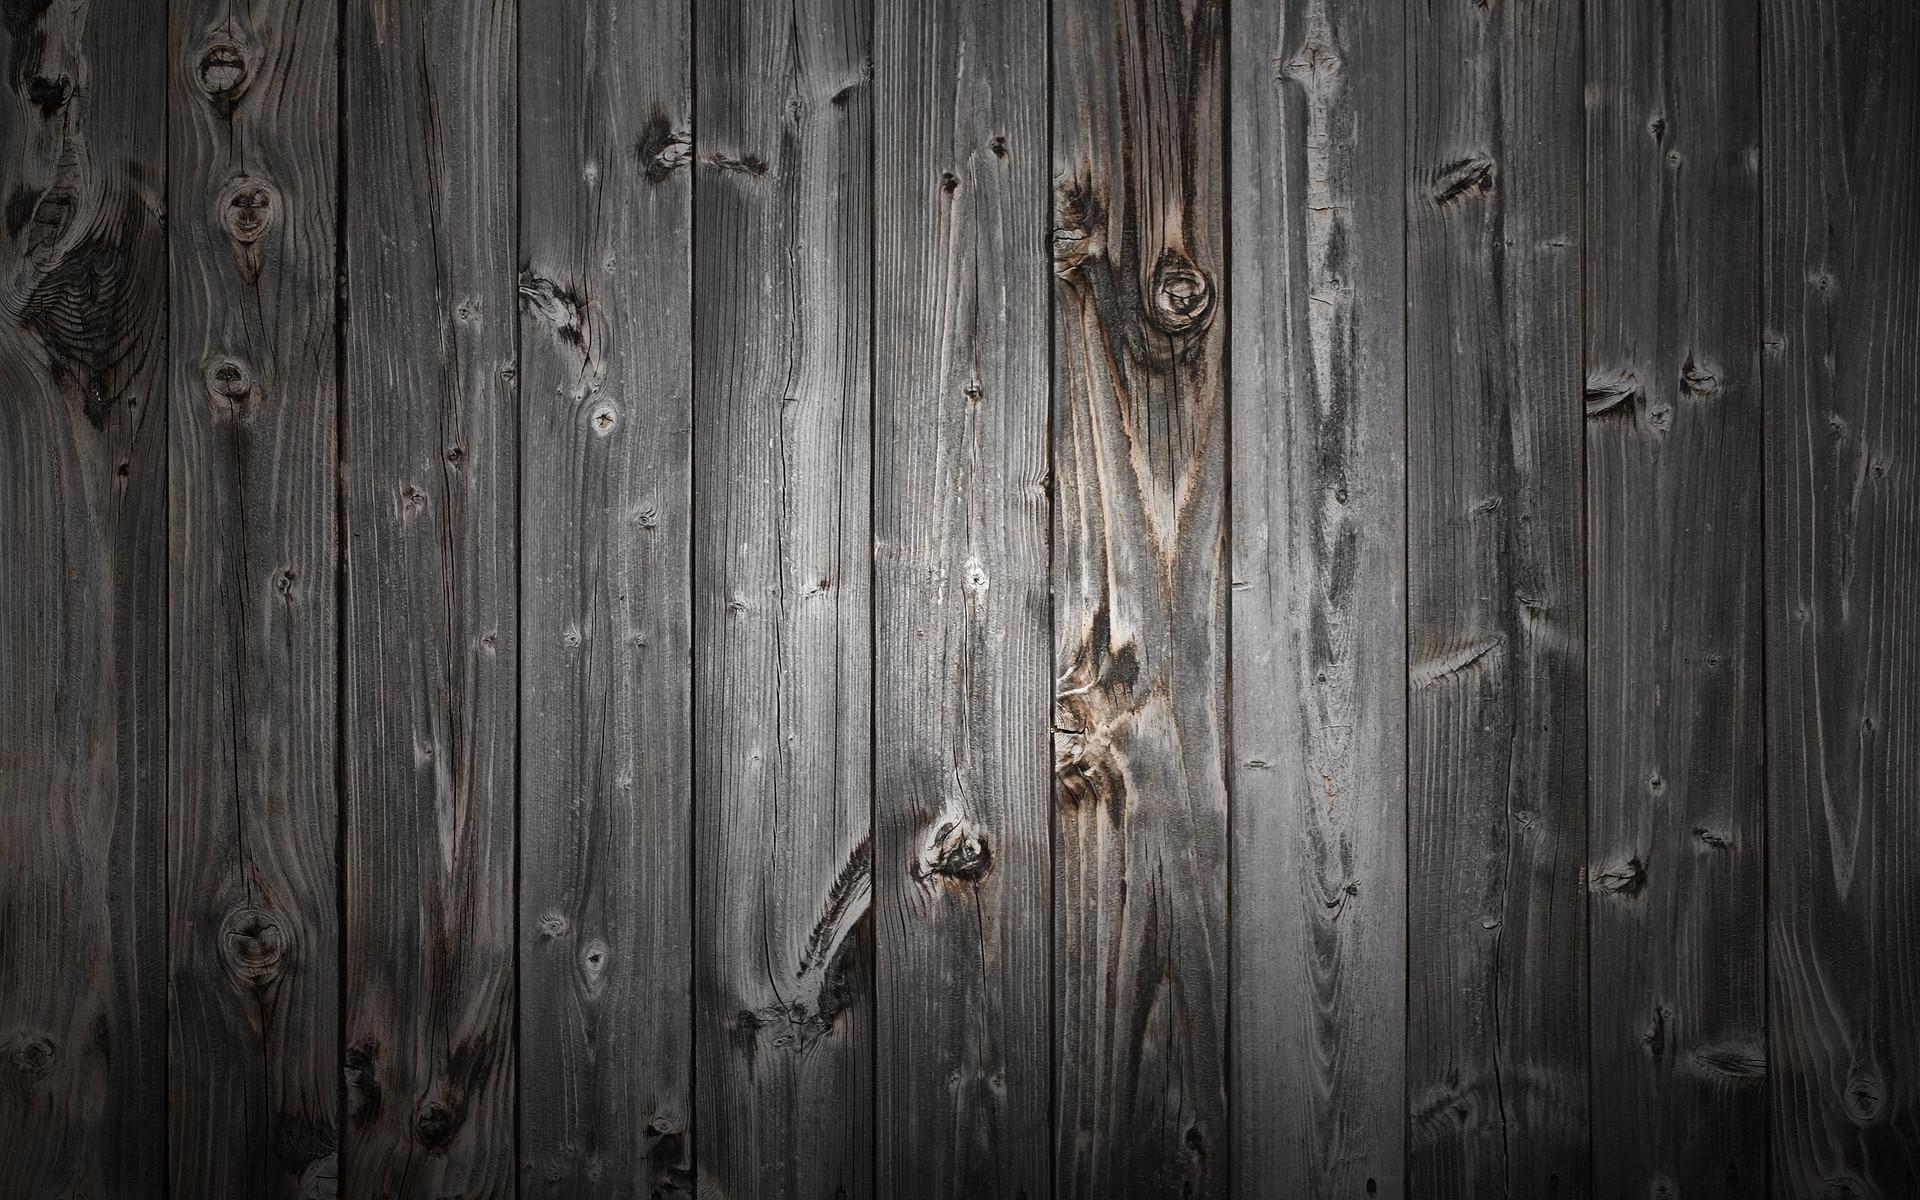 Wood panels wallpaper – 263785